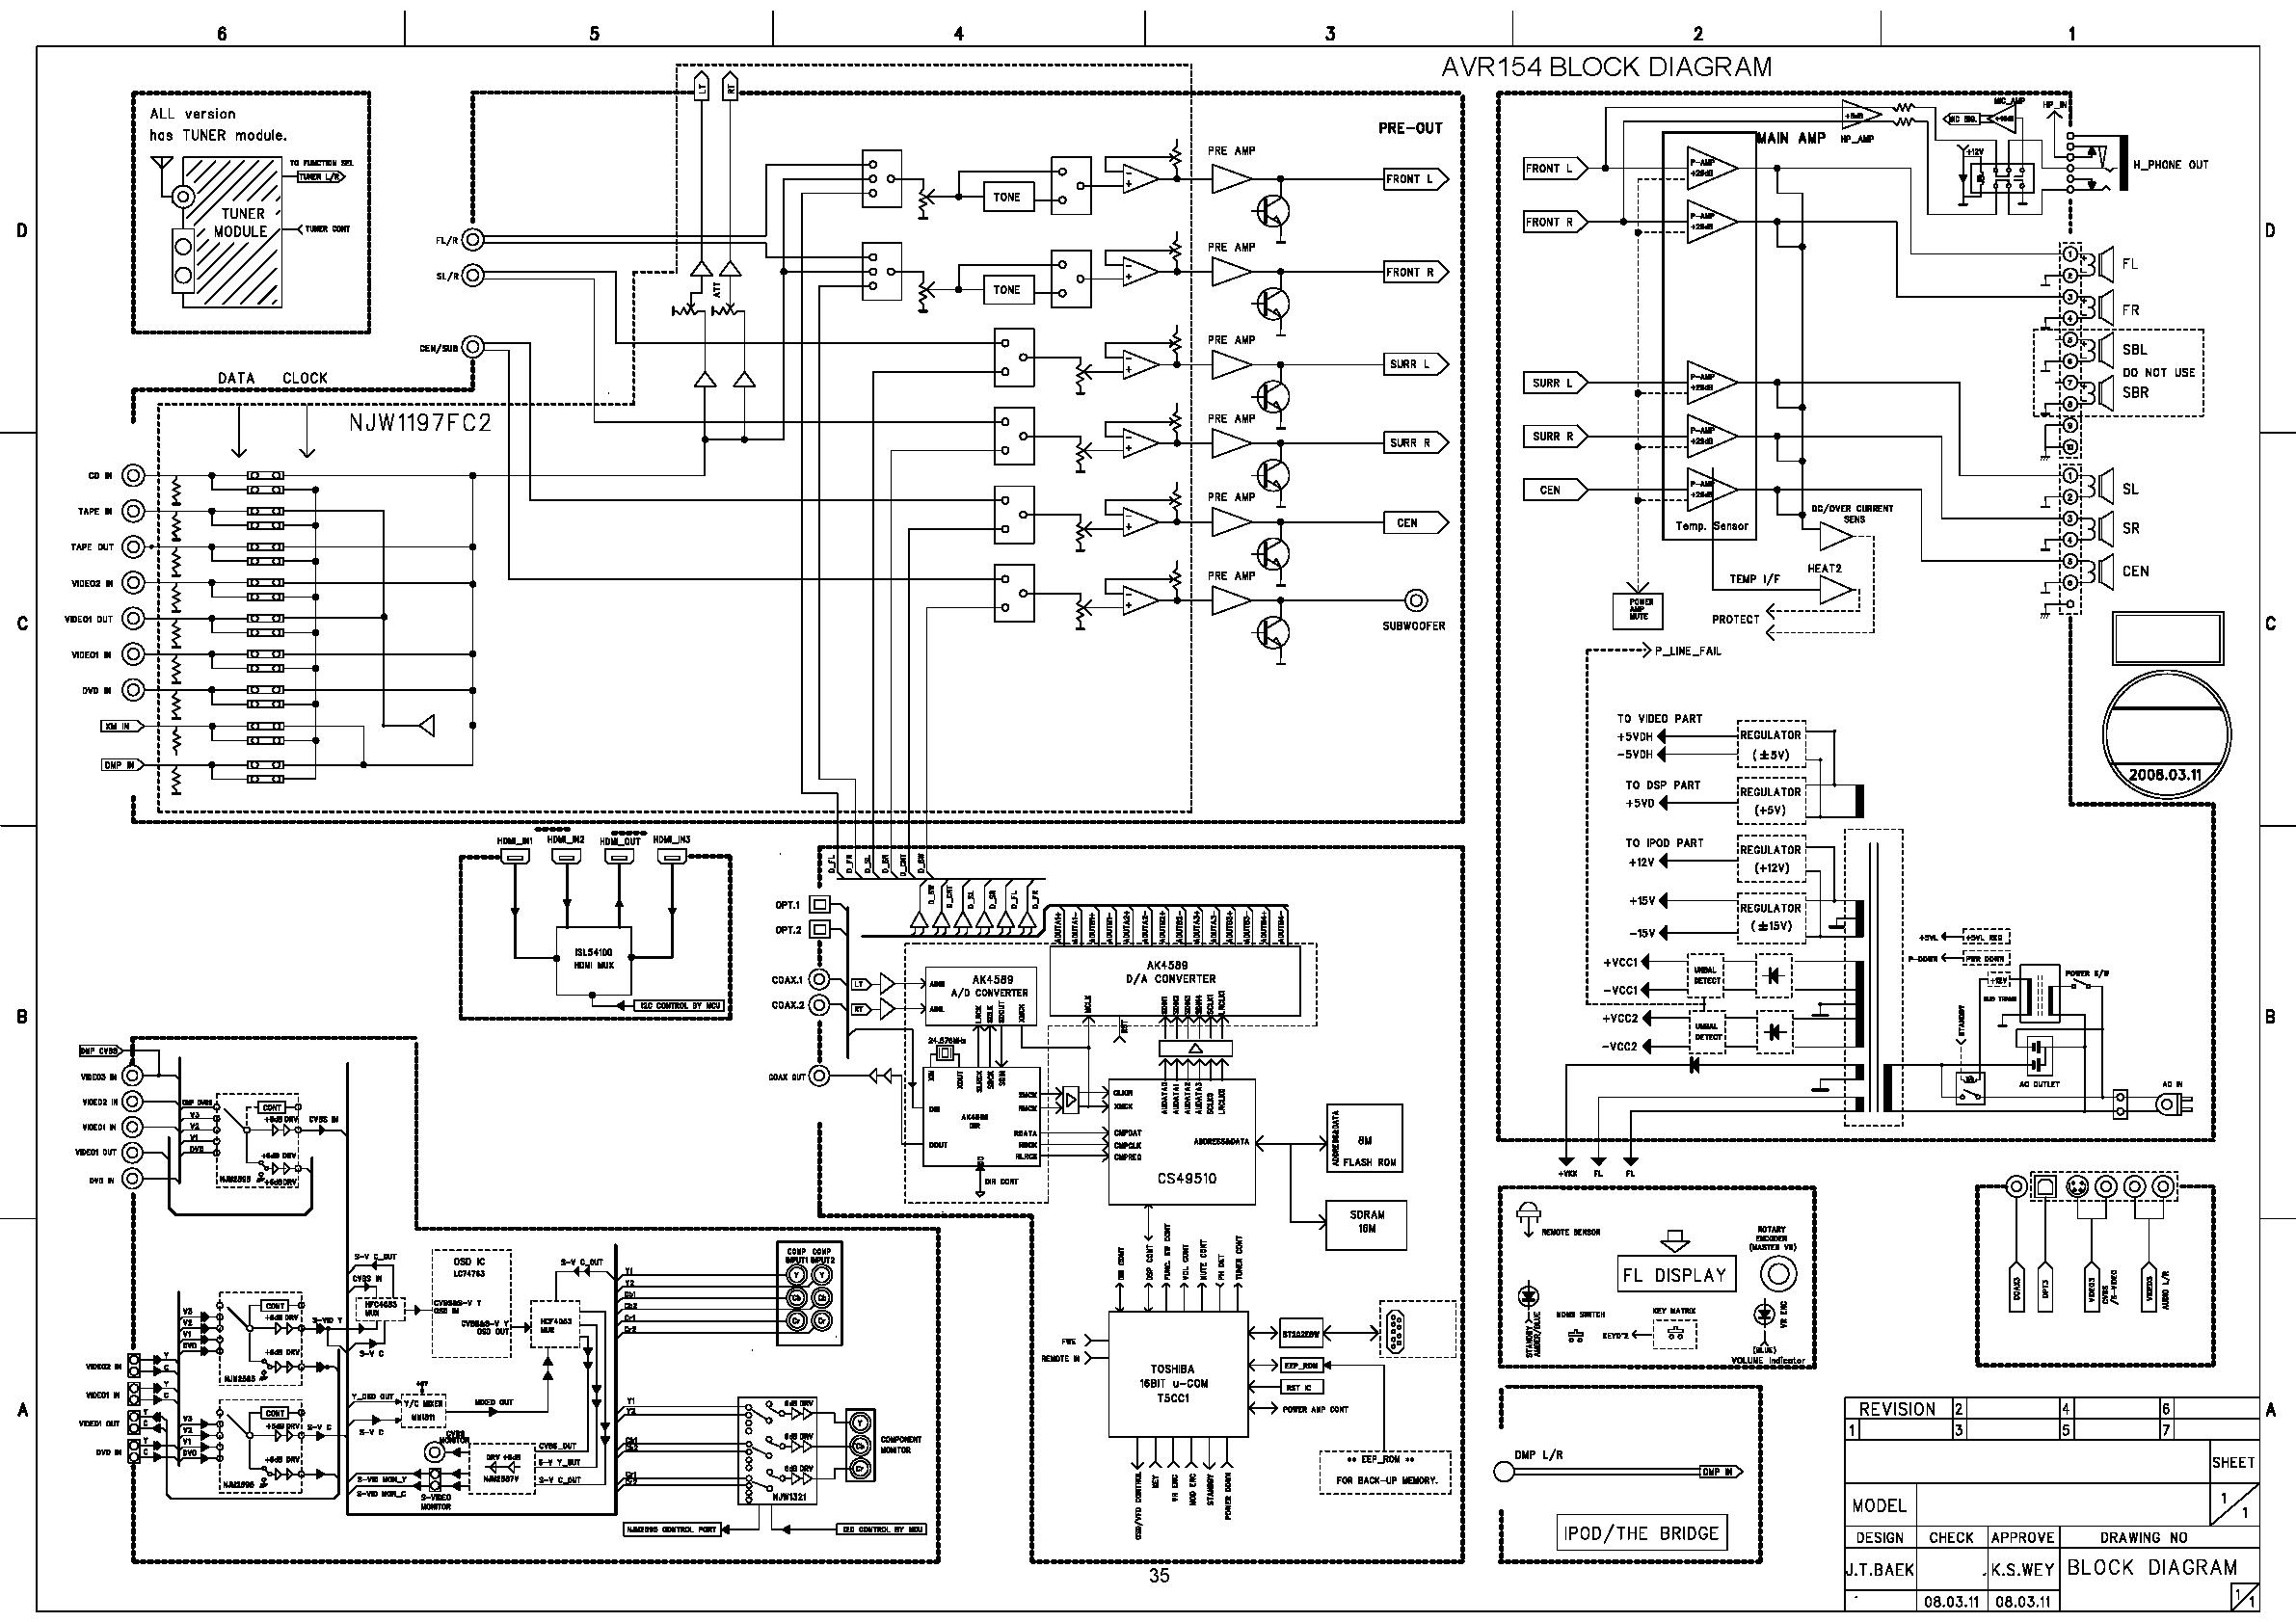 Mitsubishi Triton Fuse Box Layout 2002 Warrior Trusted Wiring Diagram Galant L200